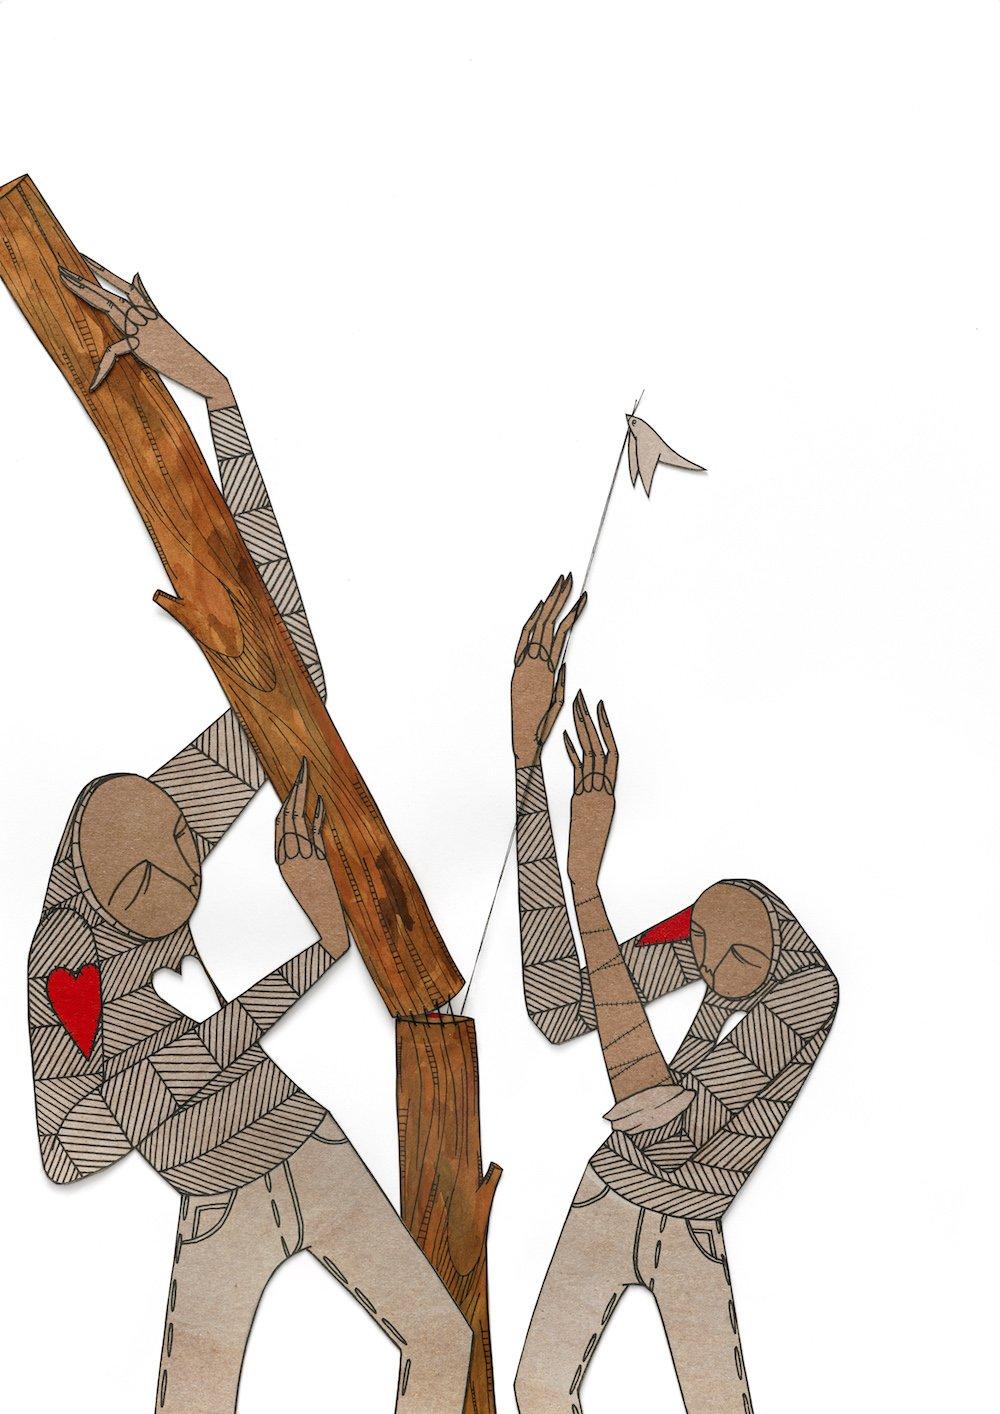 Image of 'Reconstructing a Limb' Print